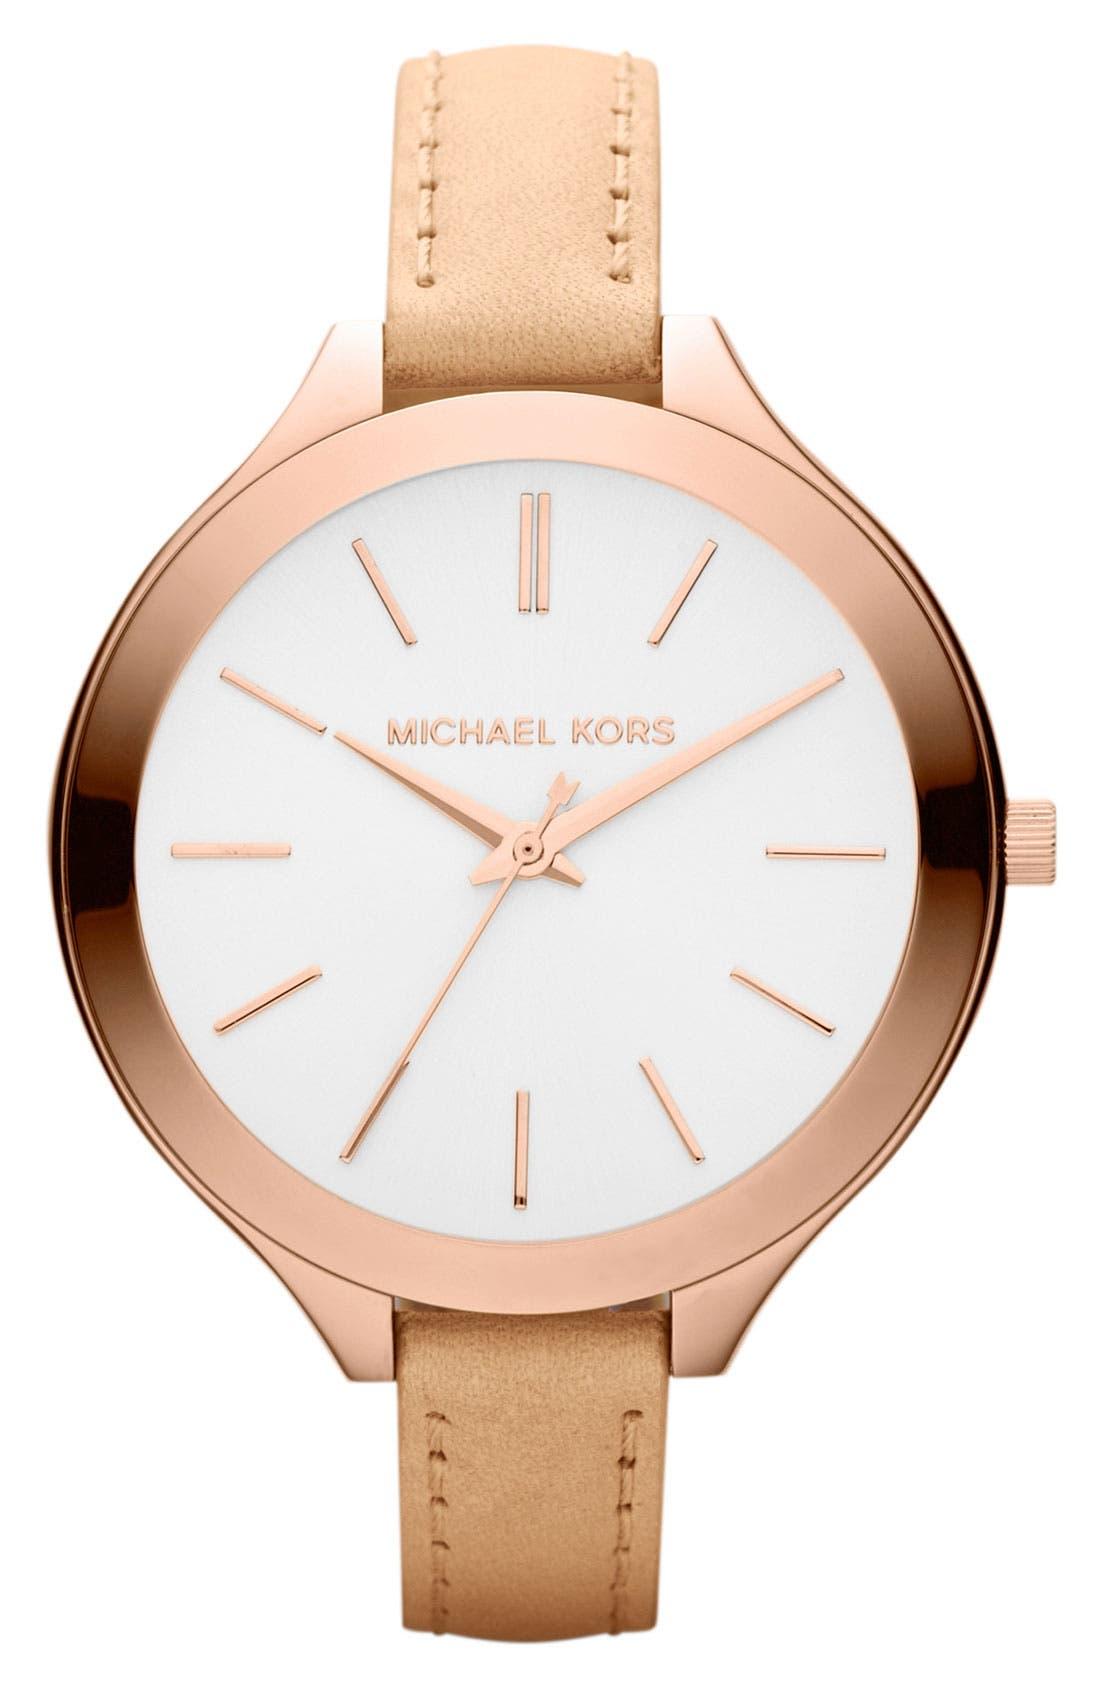 Main Image - Michael Kors 'Slim Runway' Leather Strap Watch, 42mm